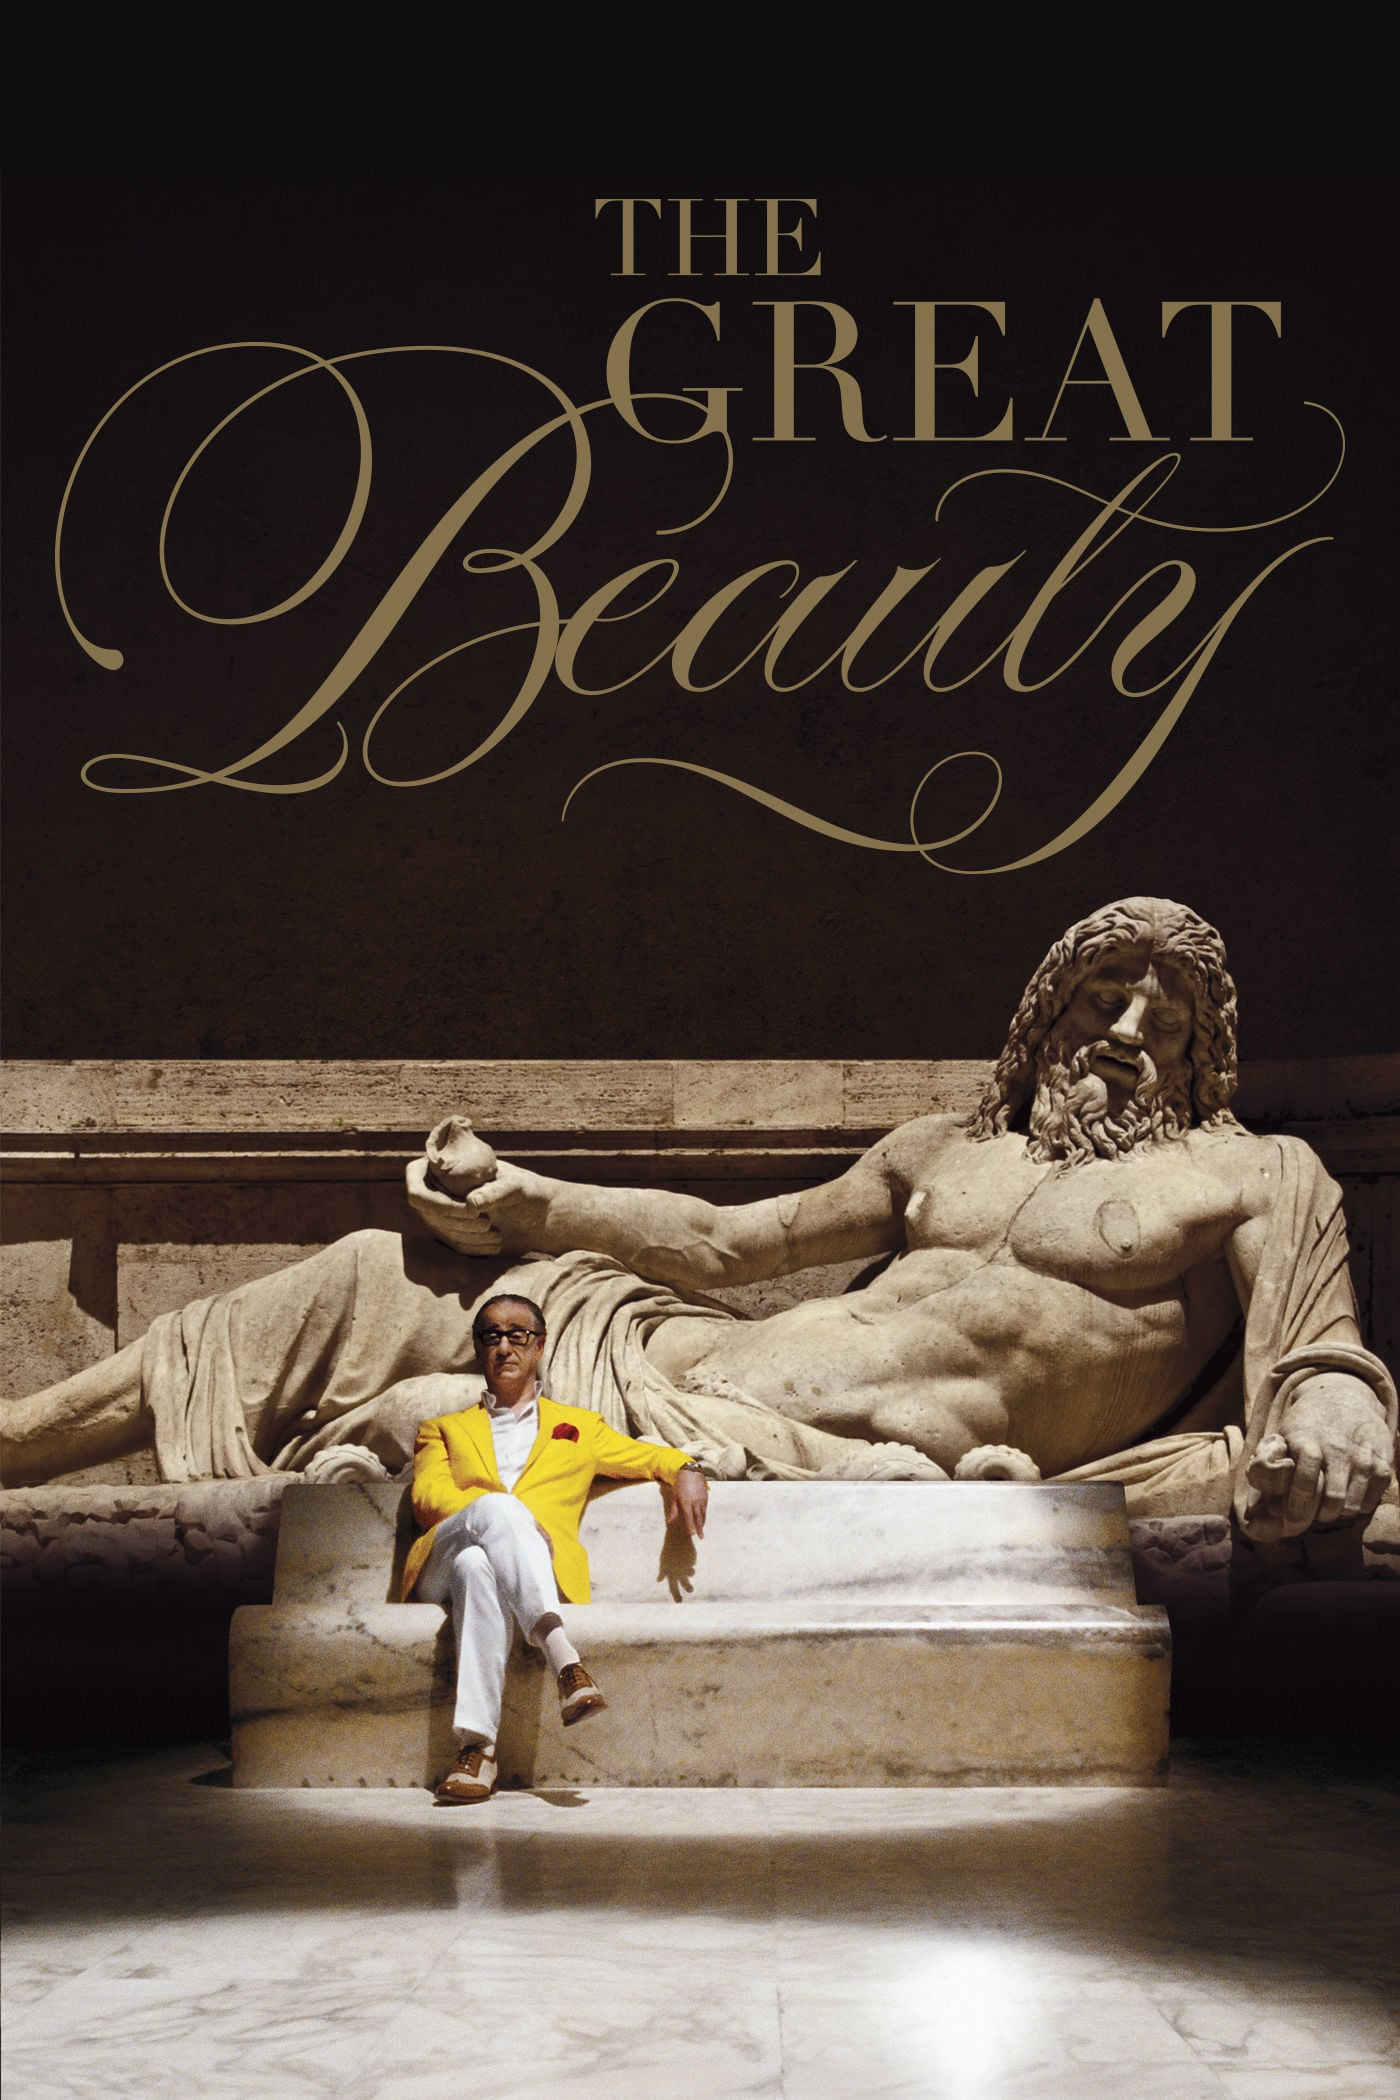 41SpGwCAwJRU0VD4y9SkNdpgmln - نقد فیلم The Great Beauty 2013 (ستایشی فلسفی از بی اخلاقی)